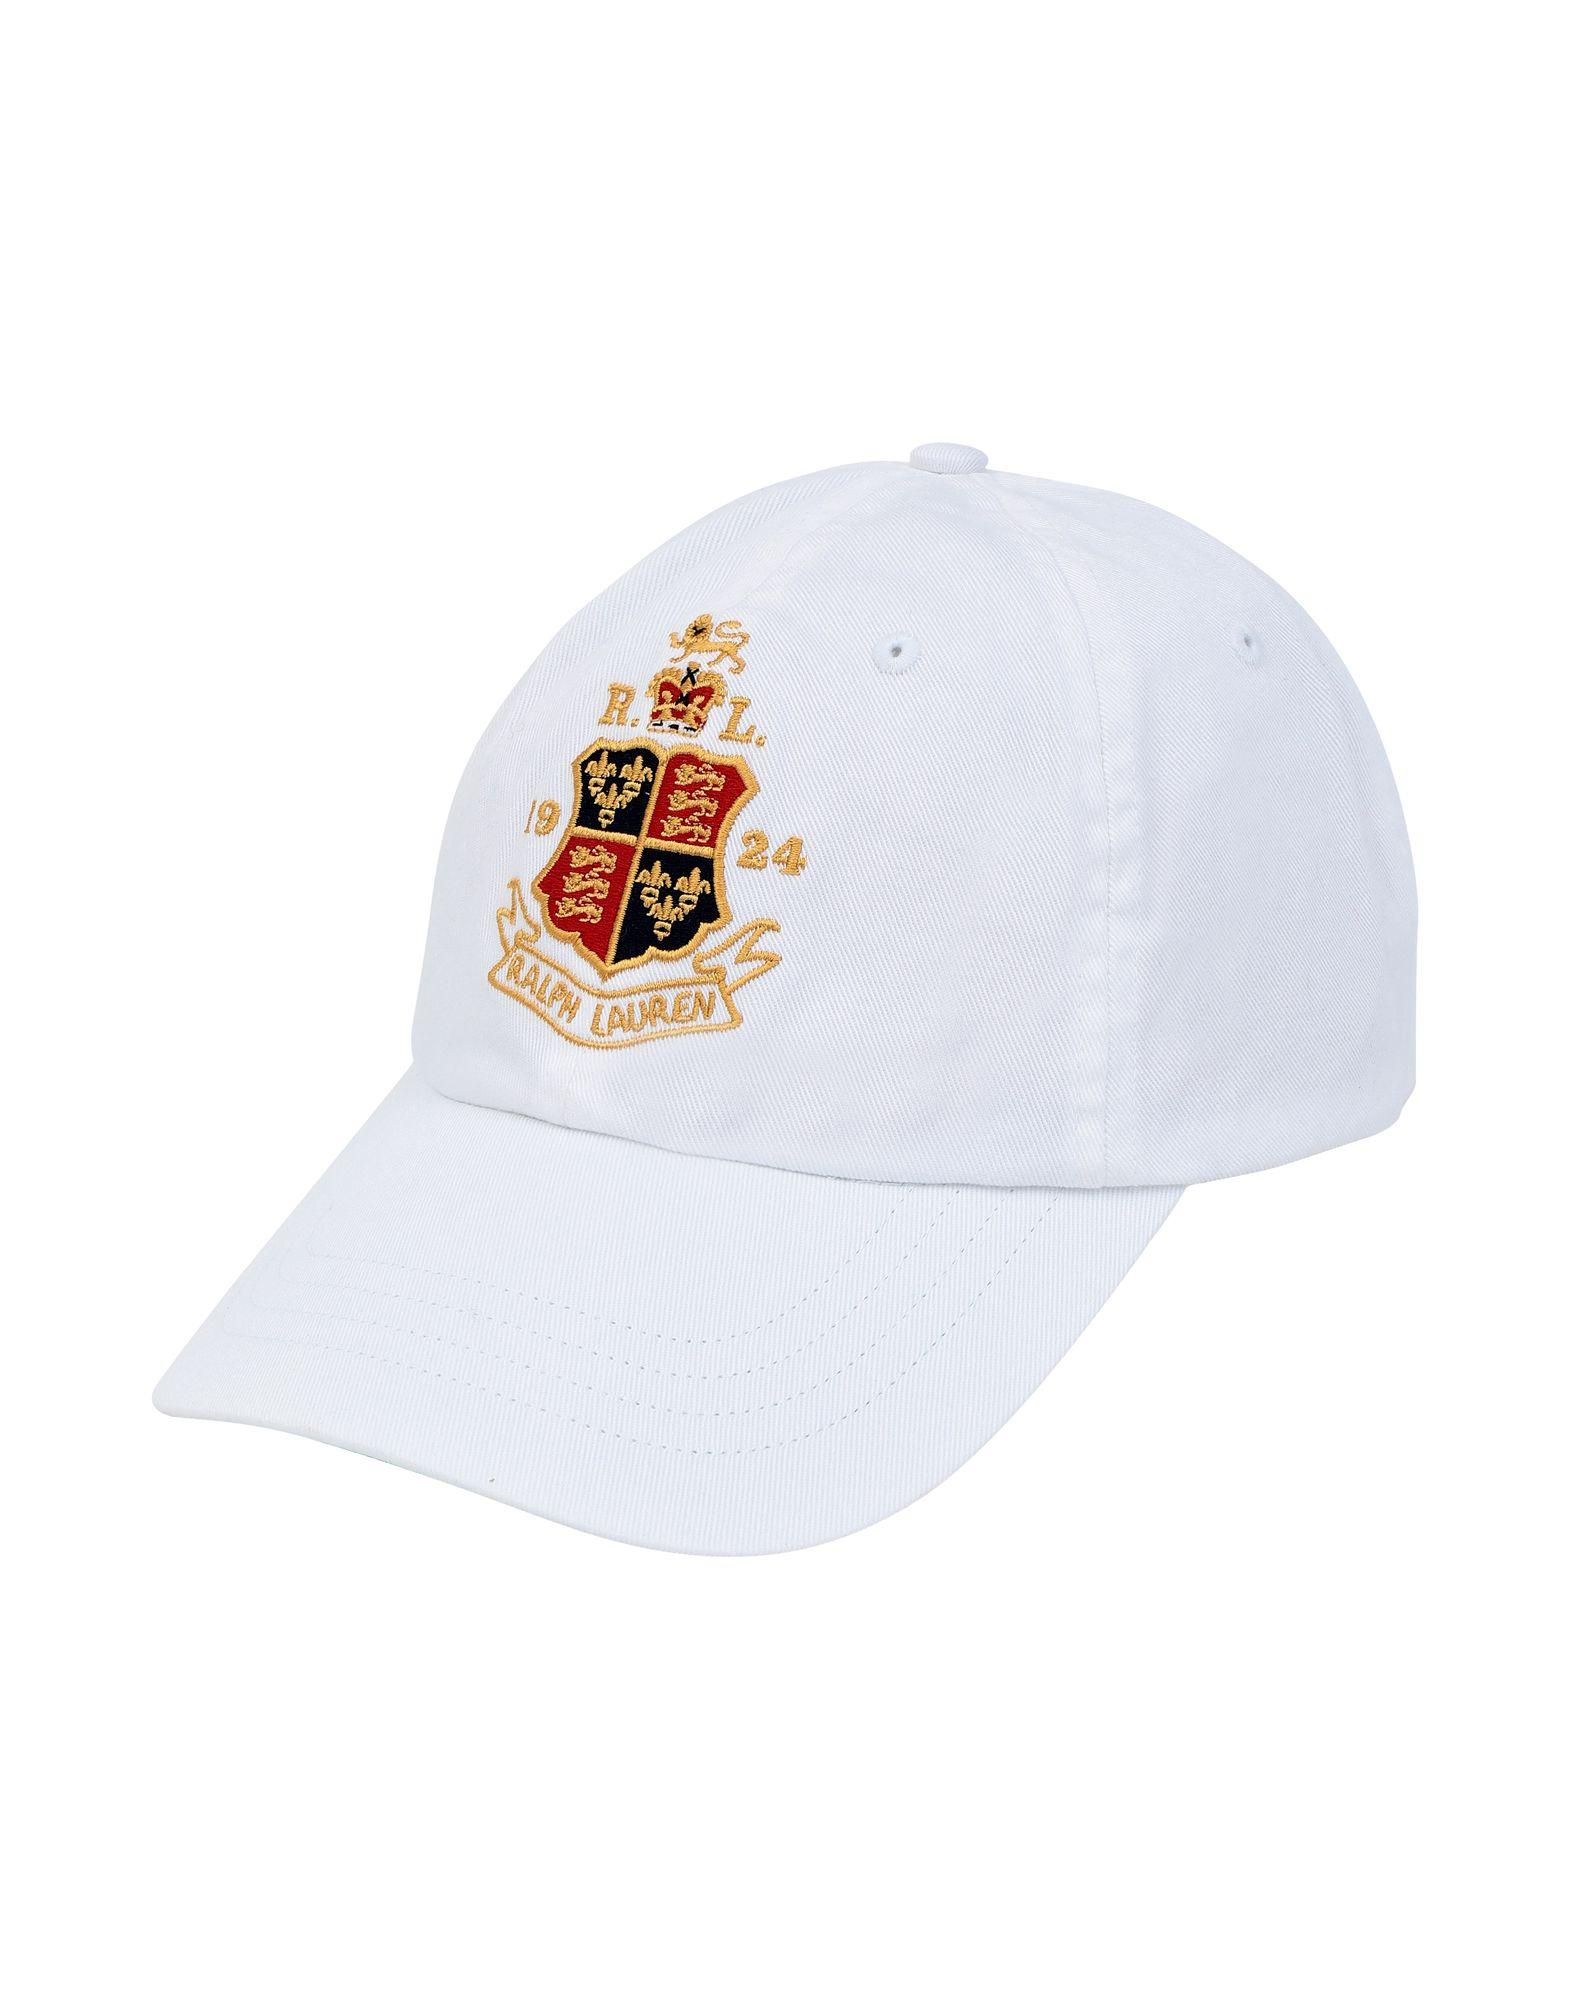 0617ff8168723 Polo Ralph Lauren Hat in White for Men - Lyst